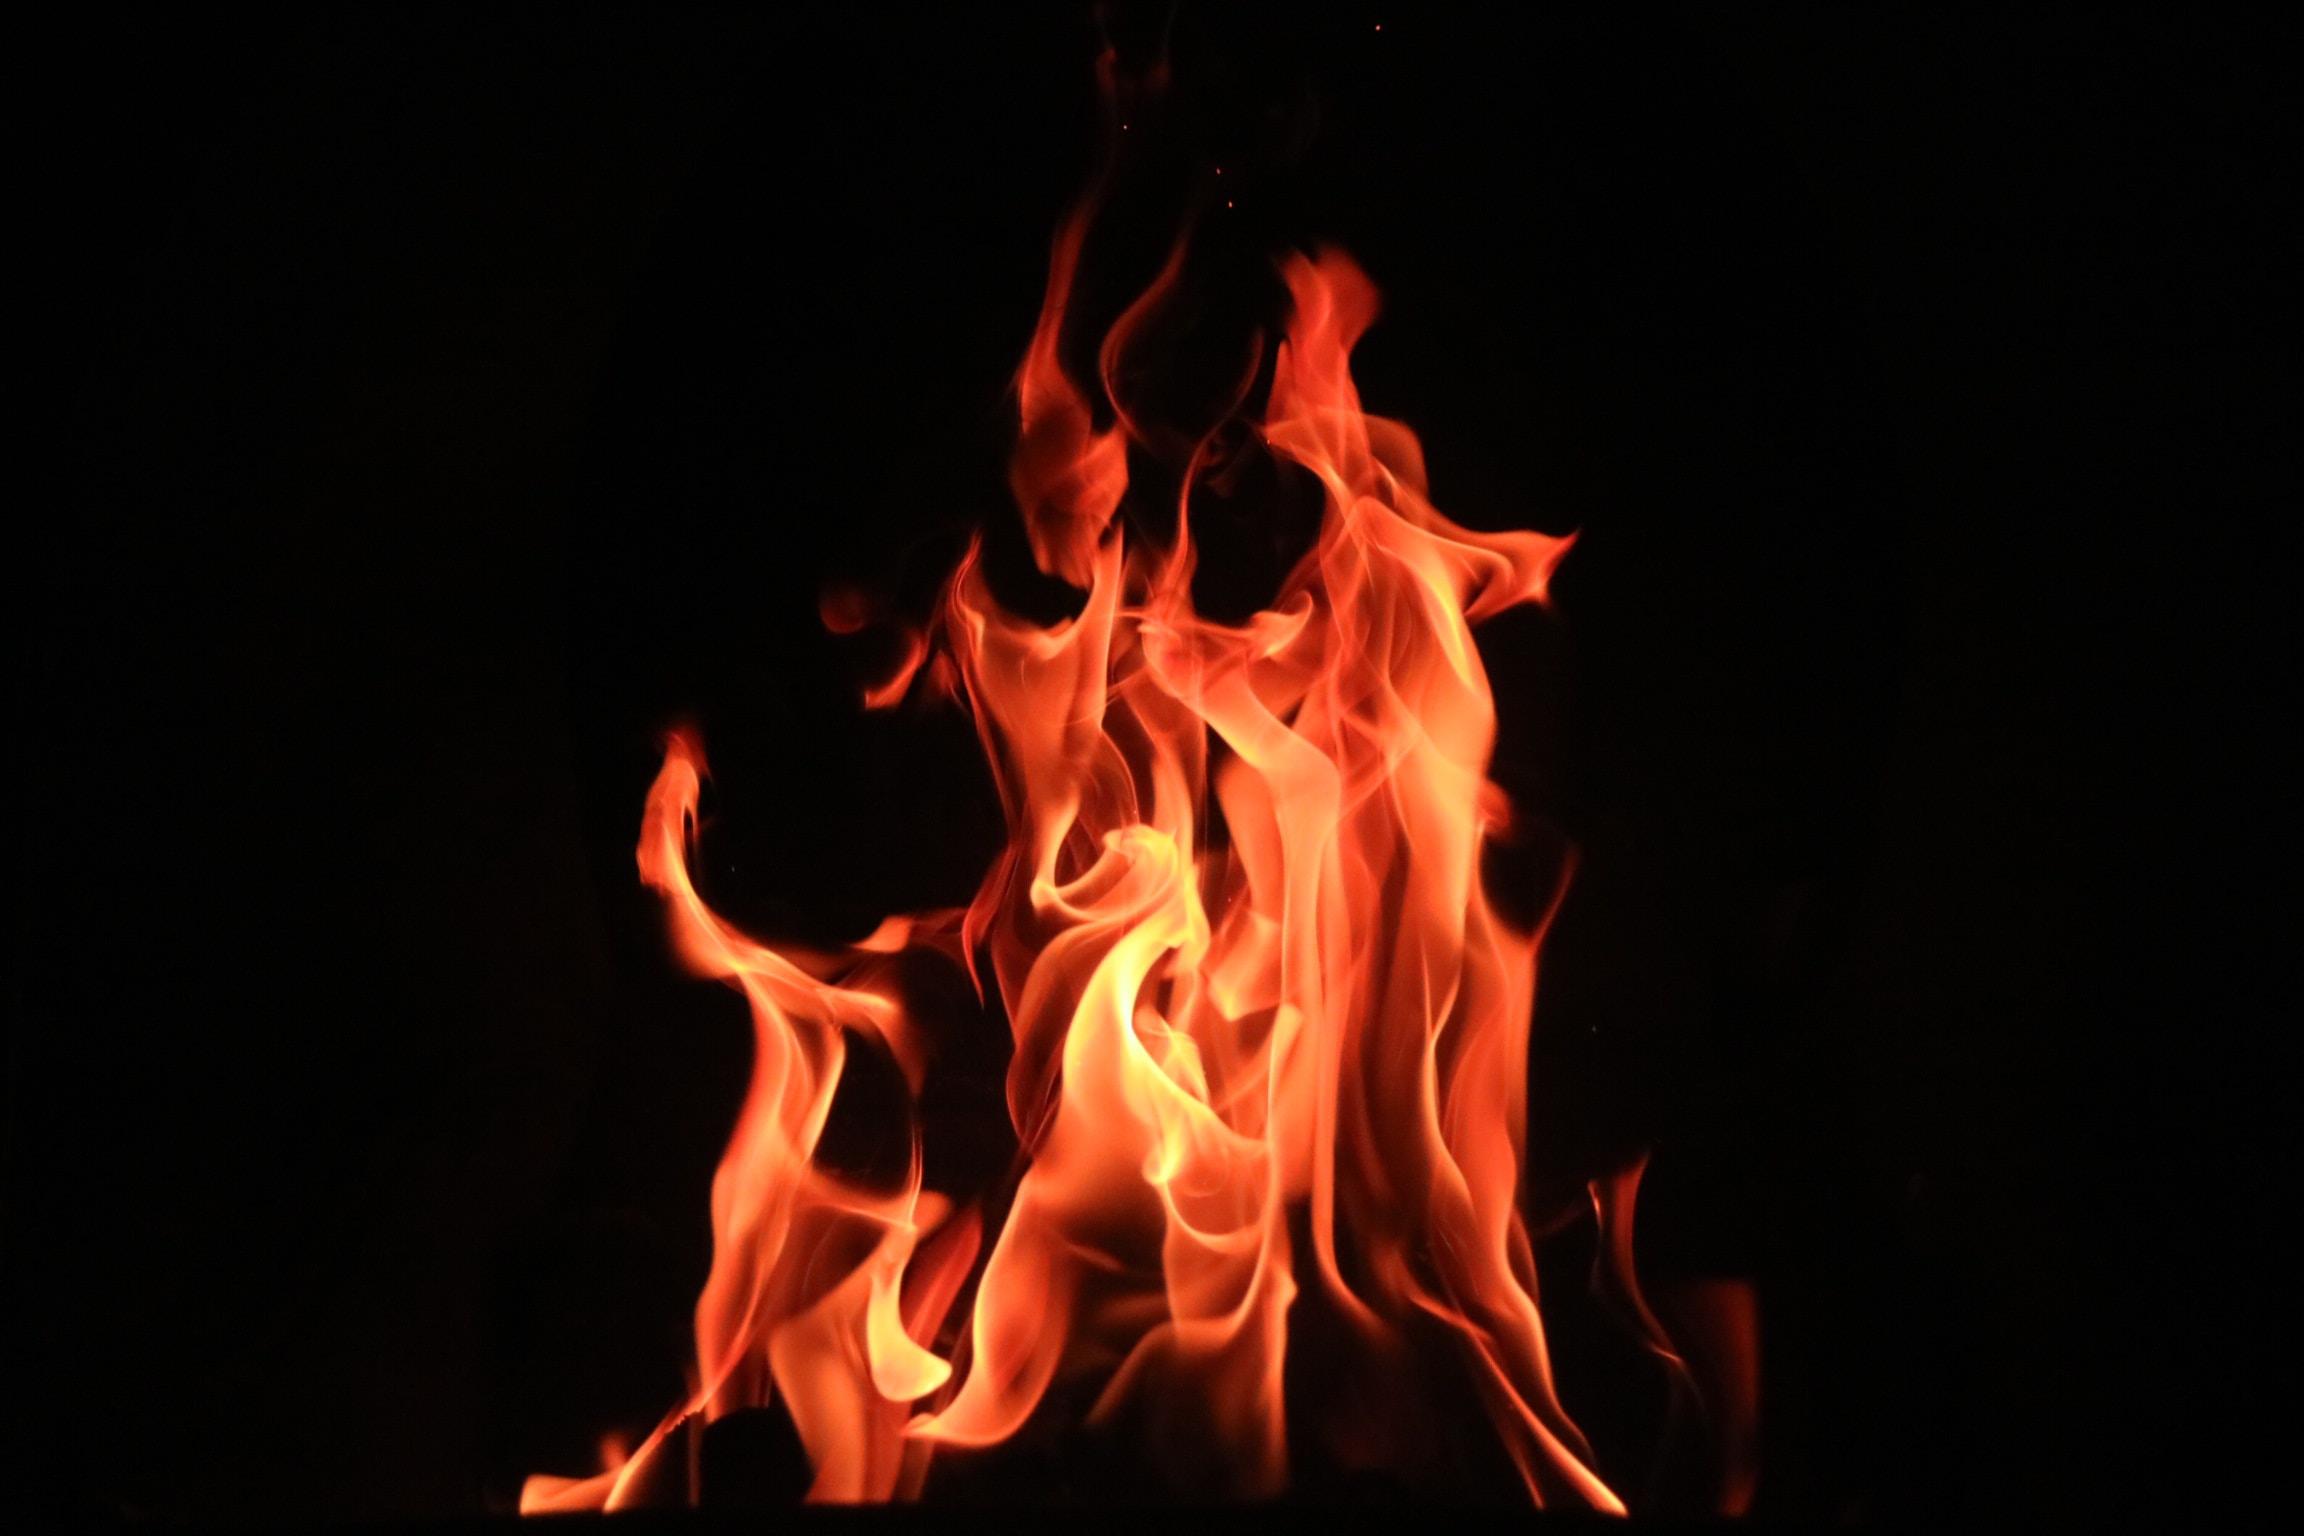 Fire on the Horizon